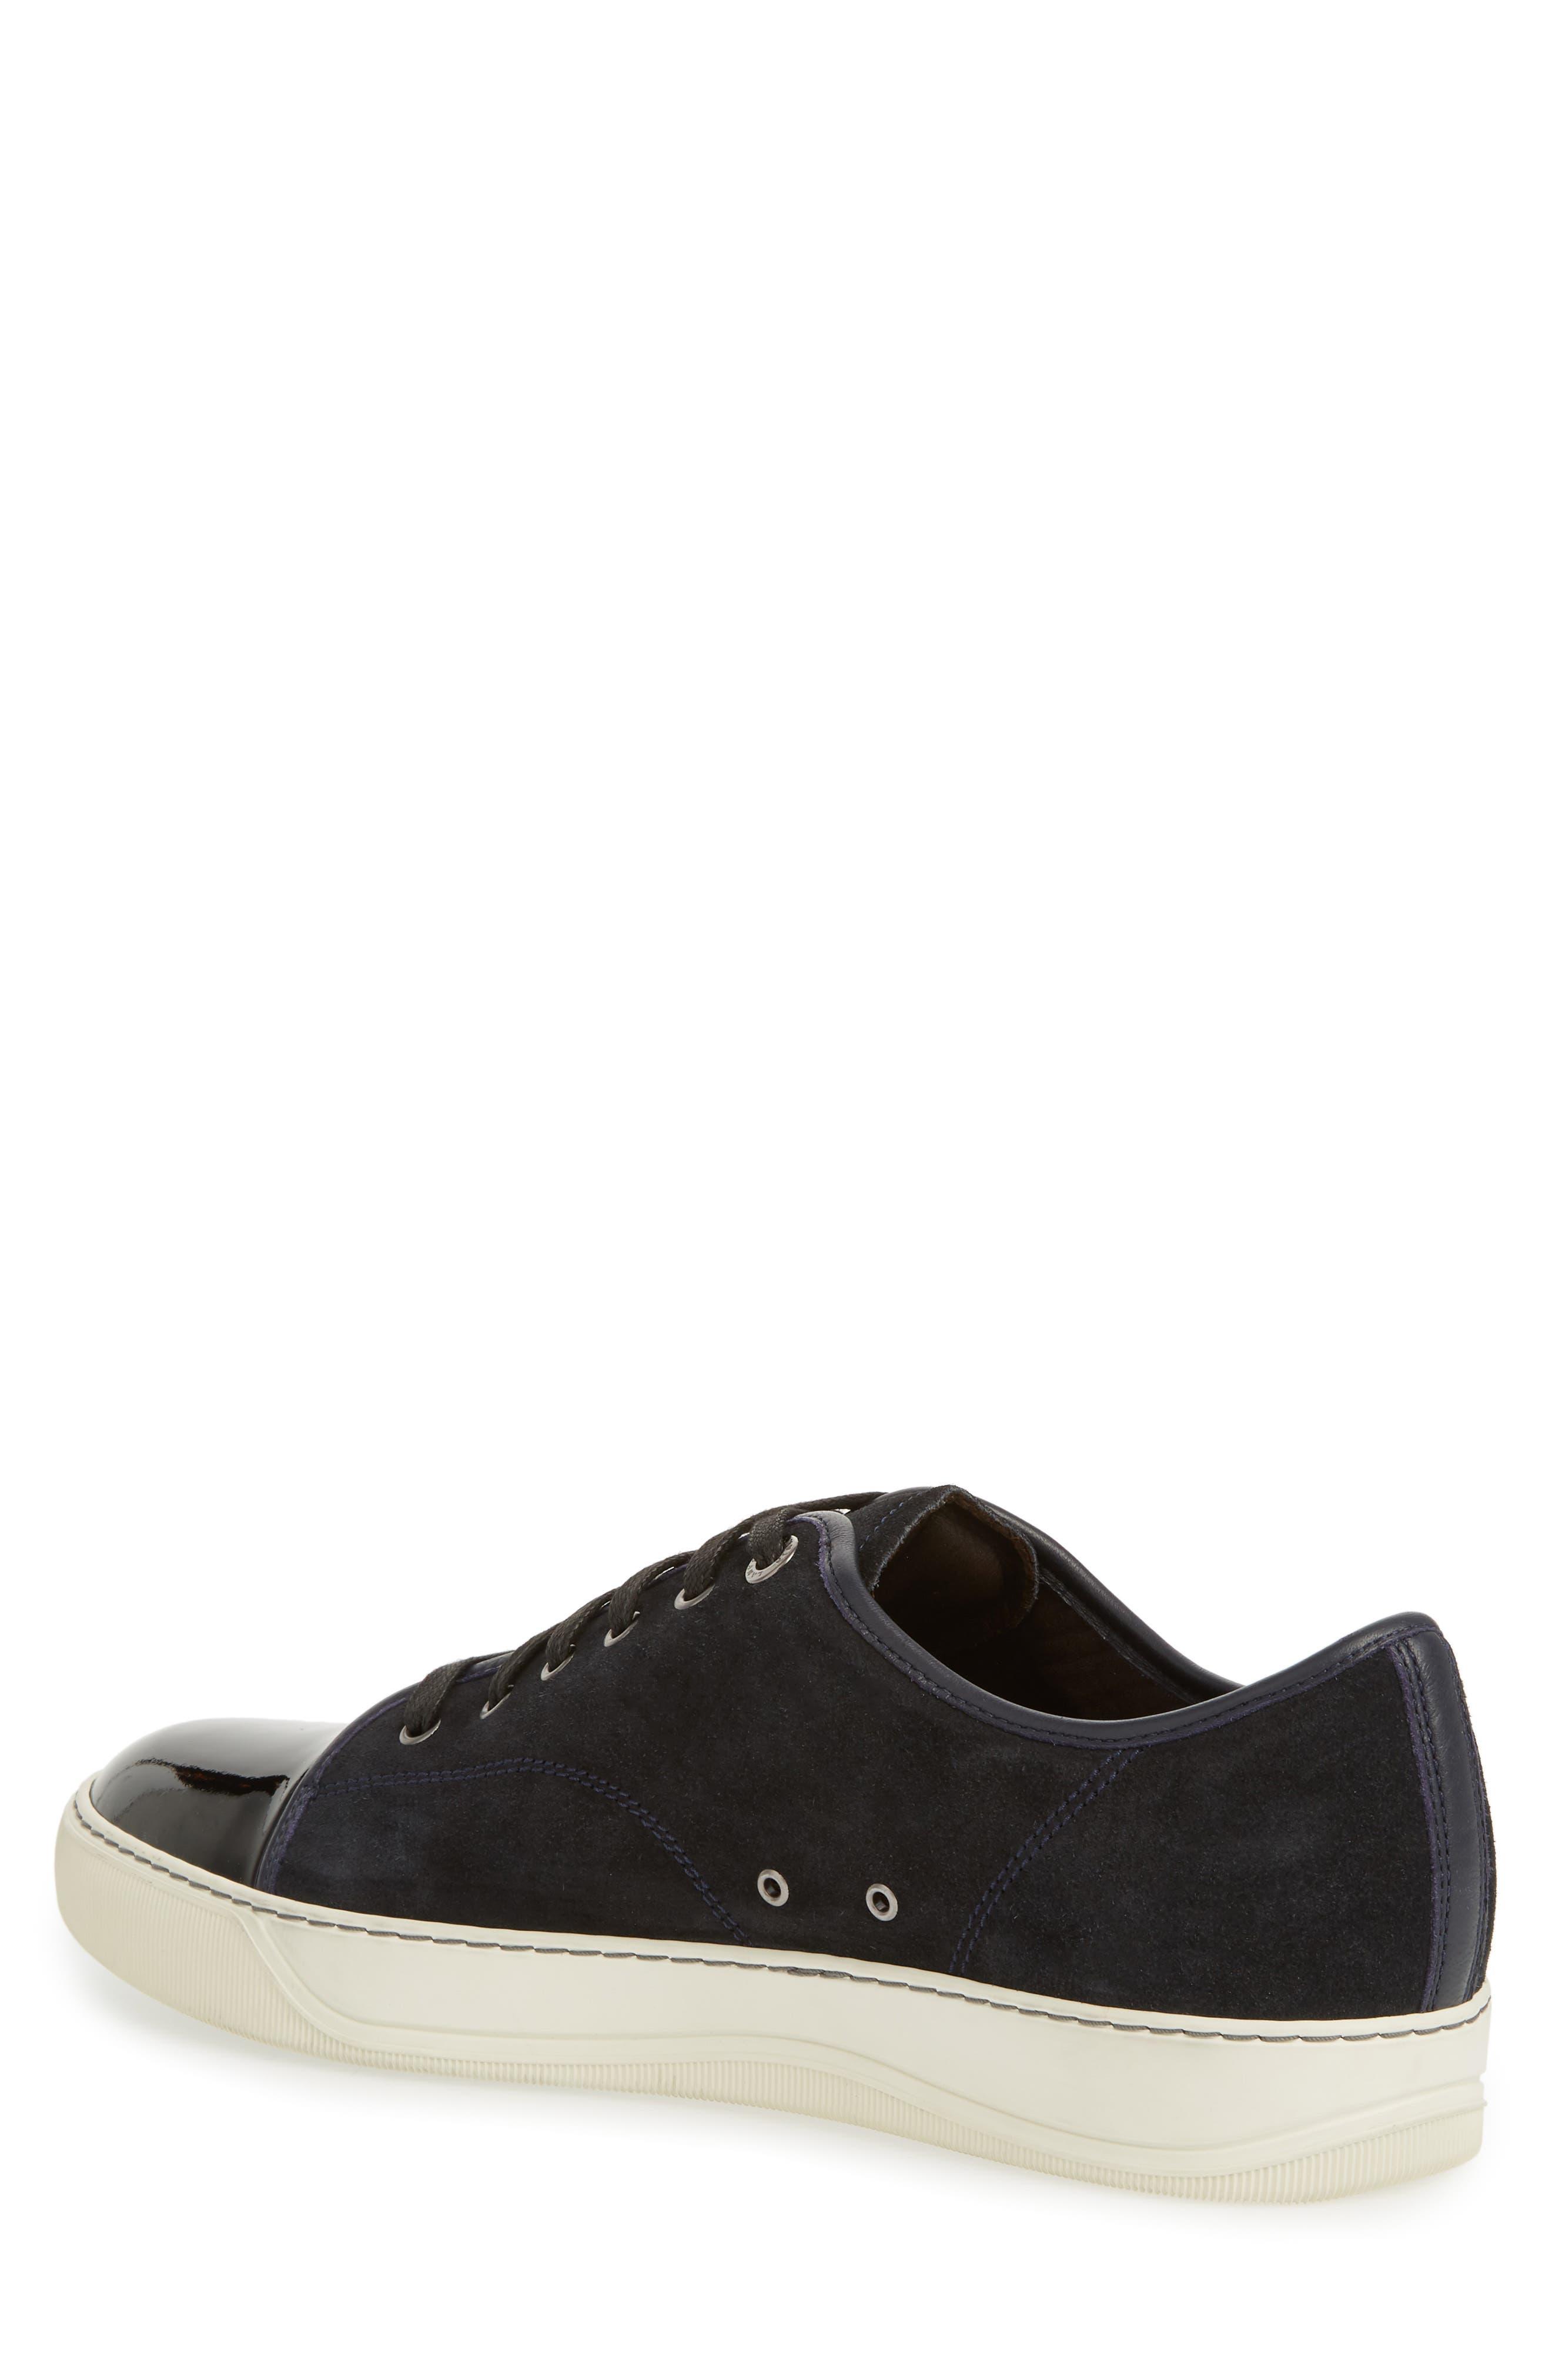 Low Top Suede Sneaker,                             Alternate thumbnail 2, color,                             024